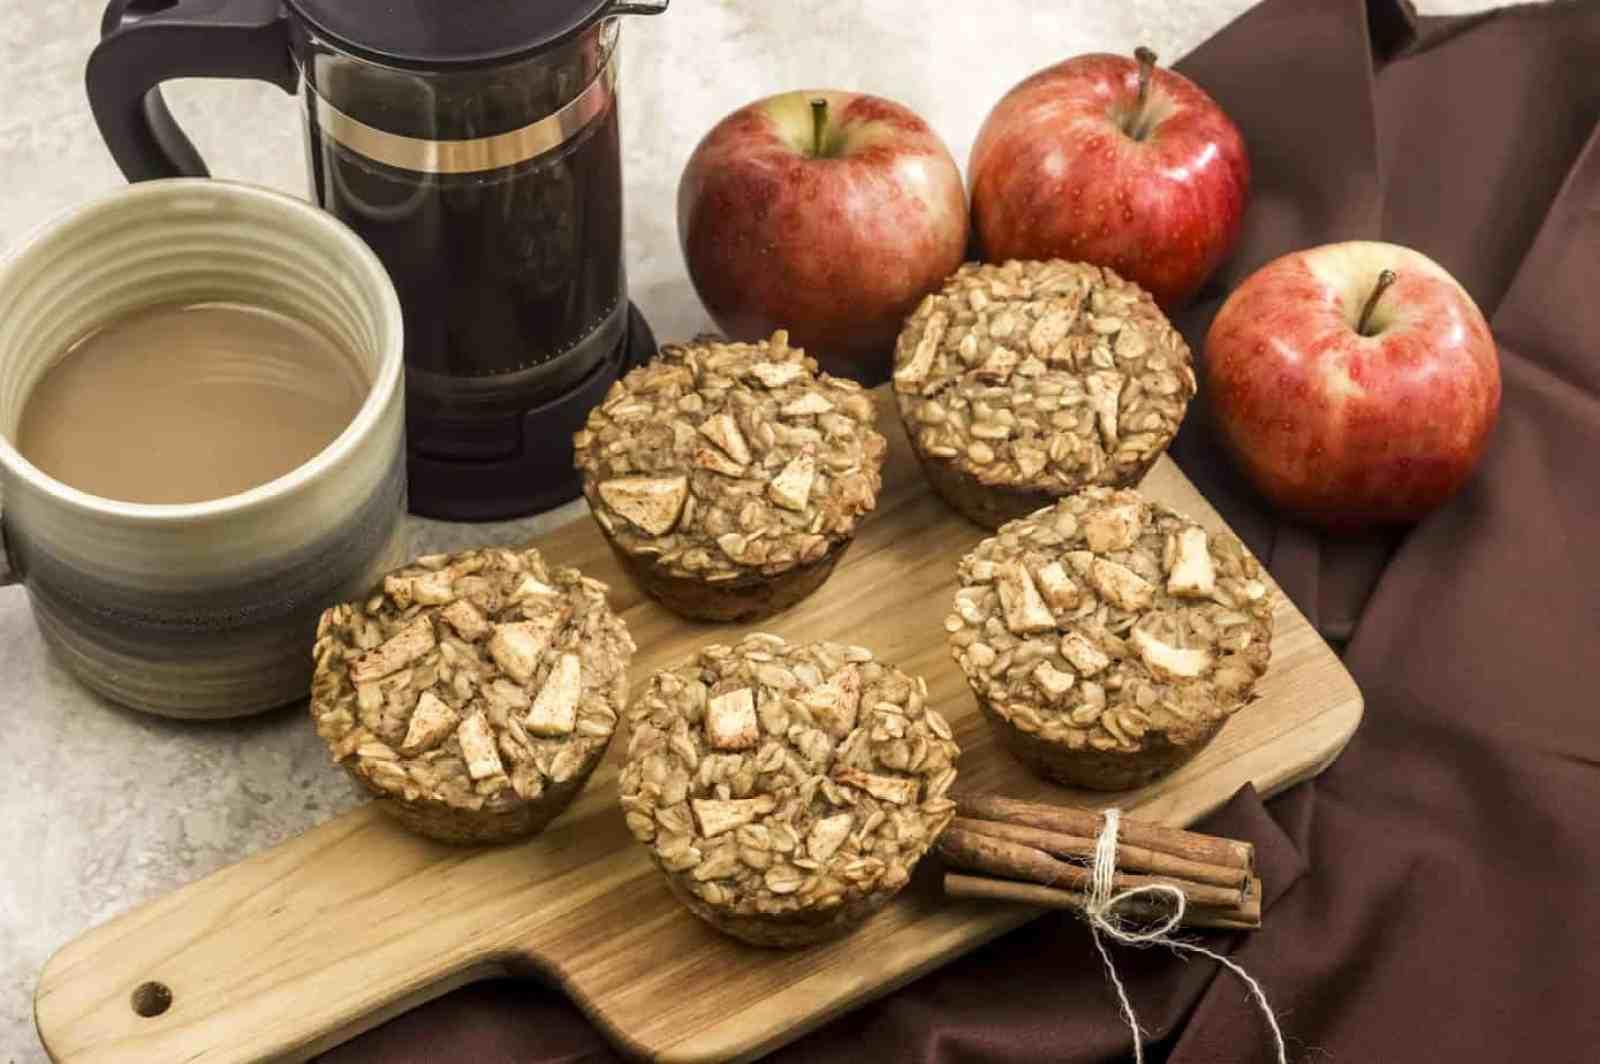 Apple Cinnamon Oatmeal Muffins finished